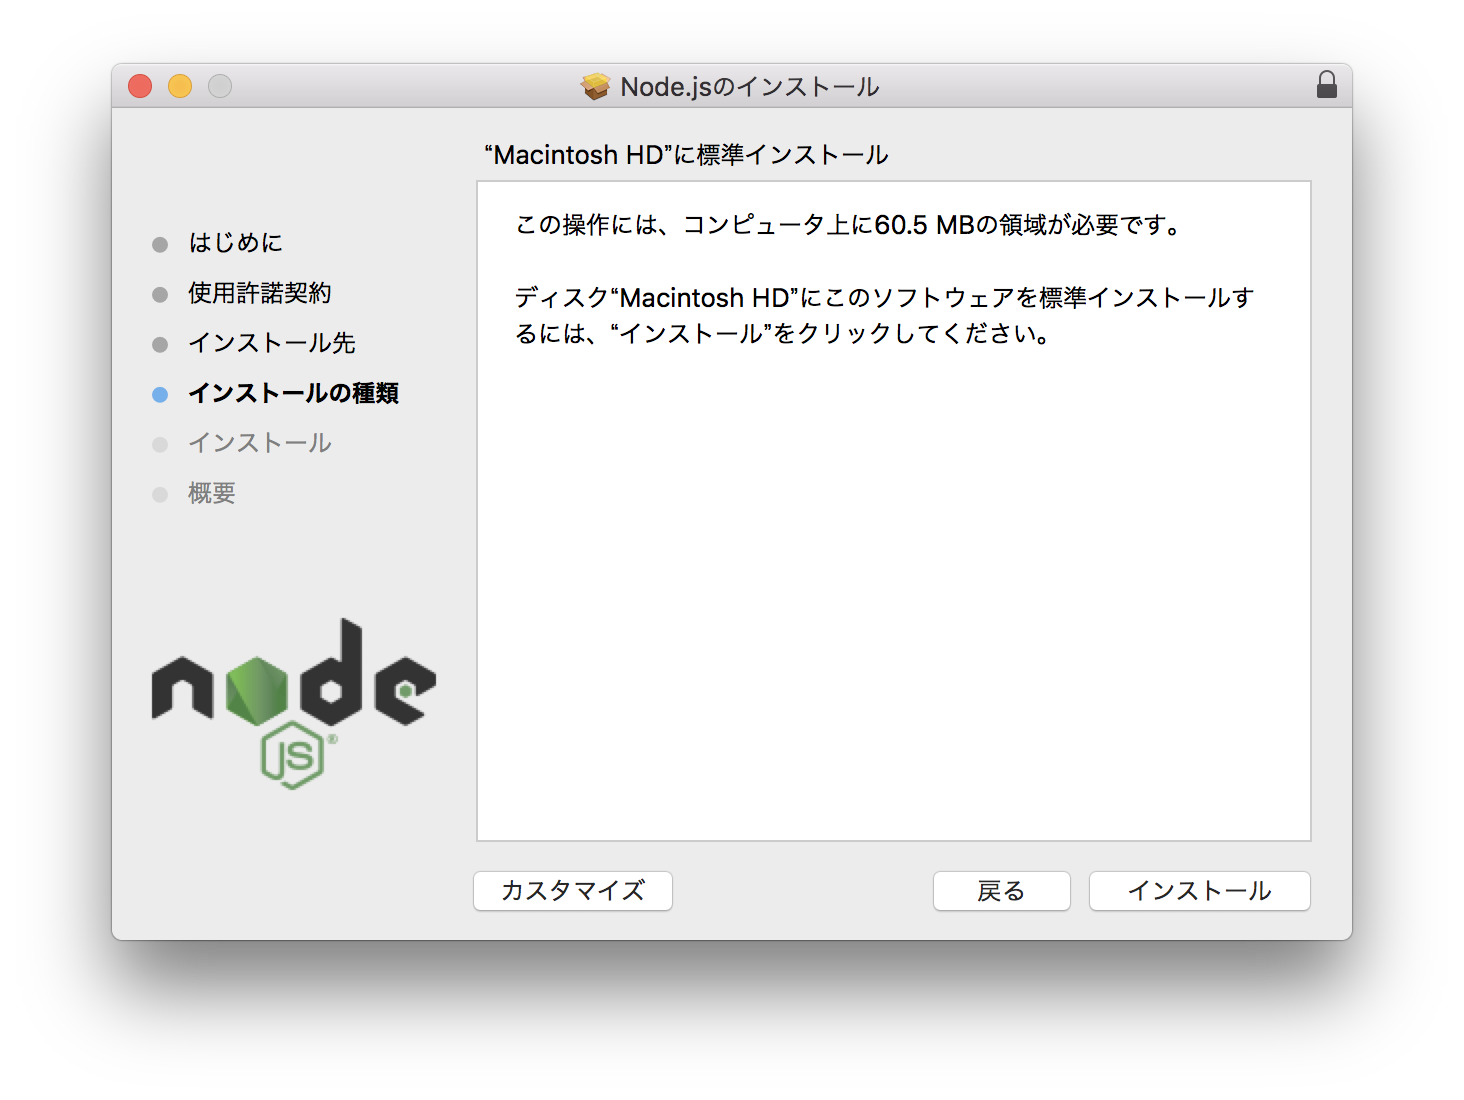 tutorial 3 6 - Node.js - ダウンロードとインストール手順